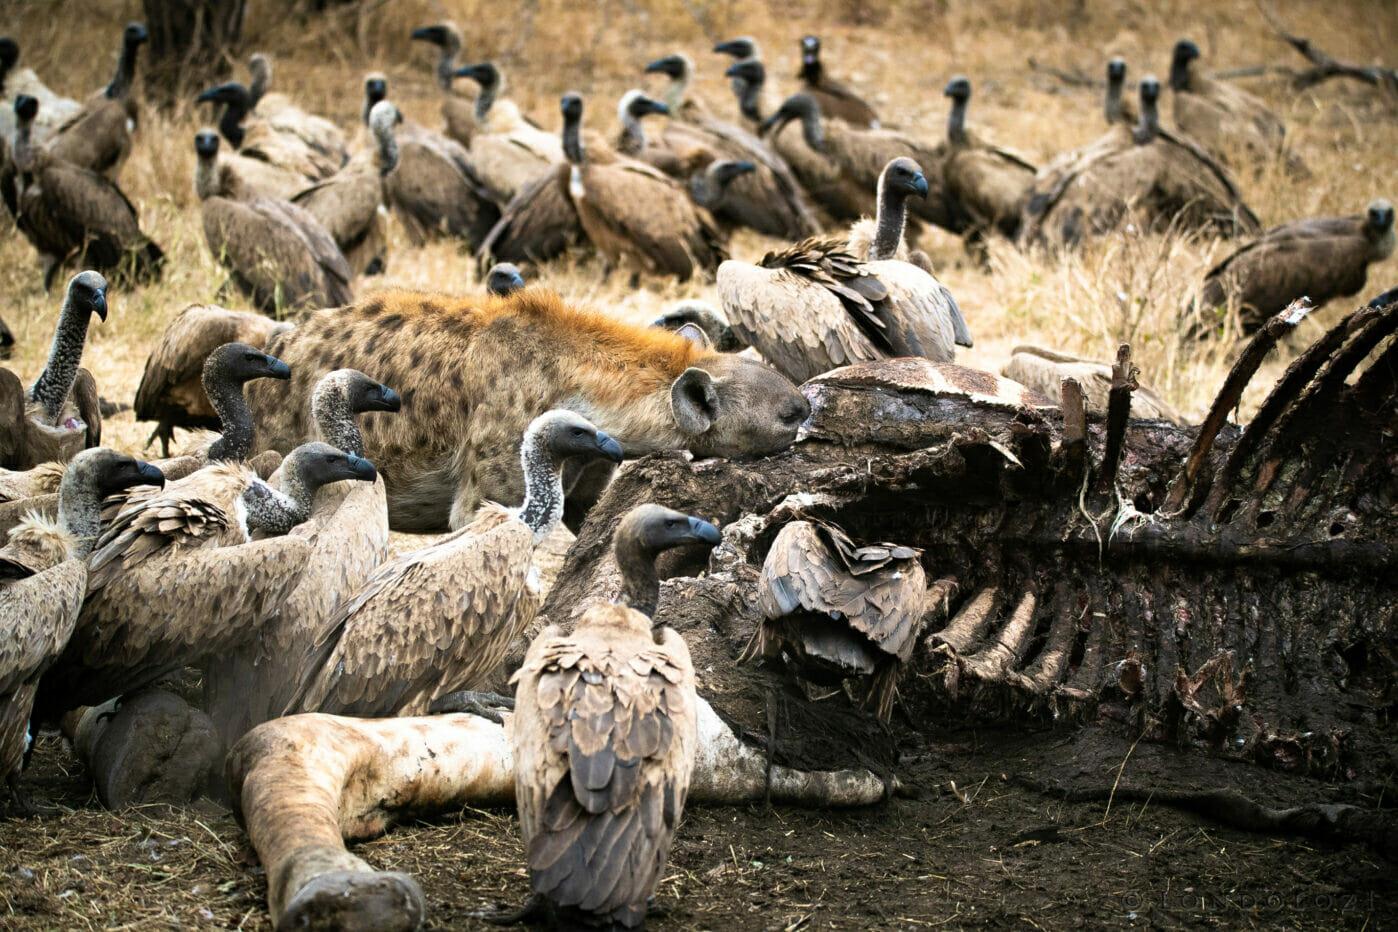 Sdz Vultures And Hyena On Giraffe Carcass